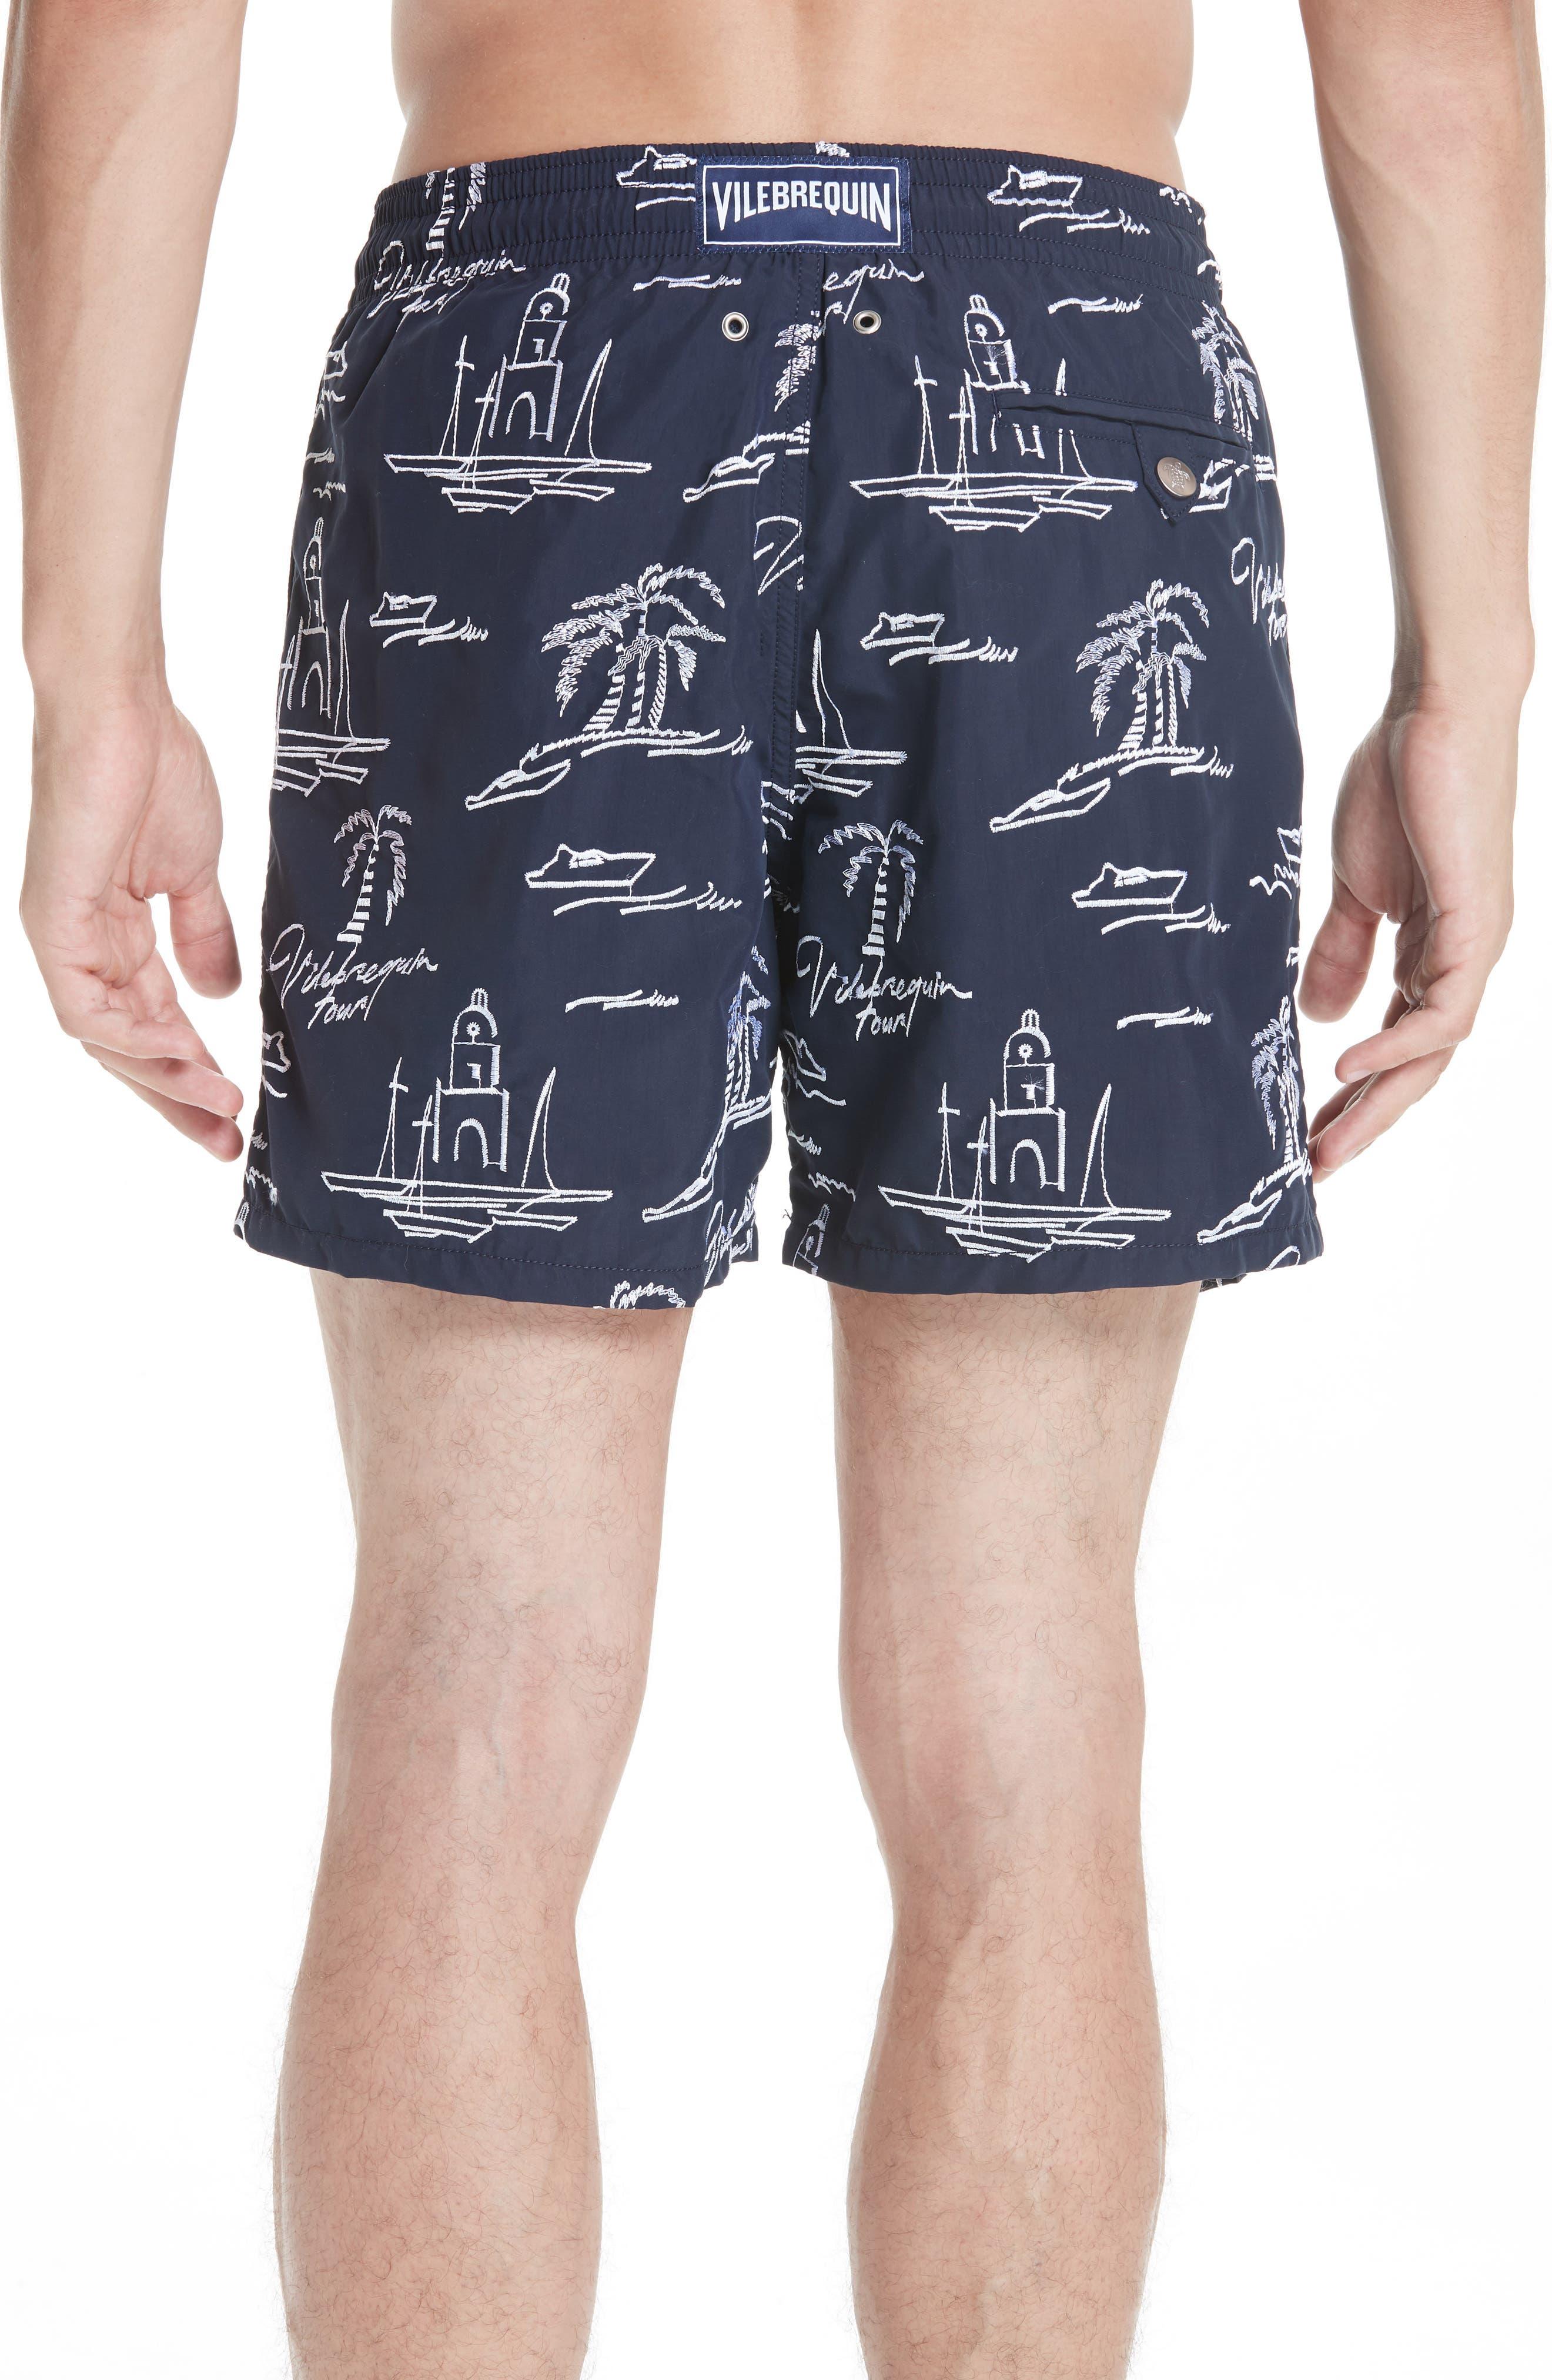 St. Tropez Embroidered Swim Trunks,                             Alternate thumbnail 2, color,                             BLUE